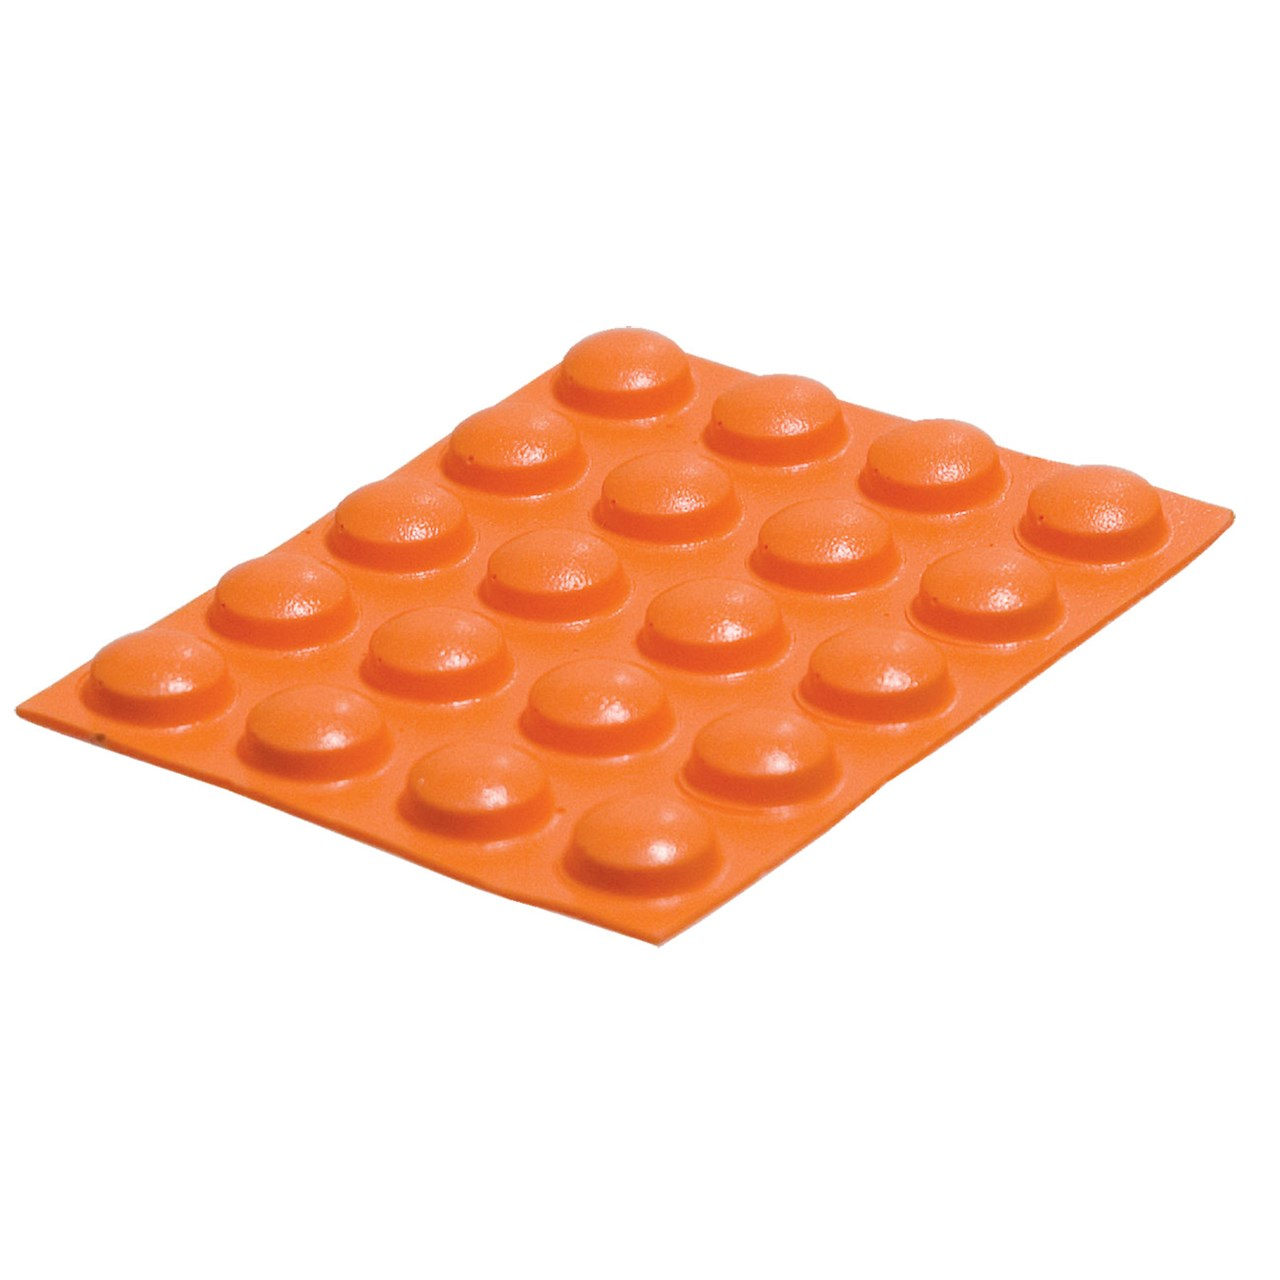 Maxiaids Bump Dots Large Orange Round 20 Pcs